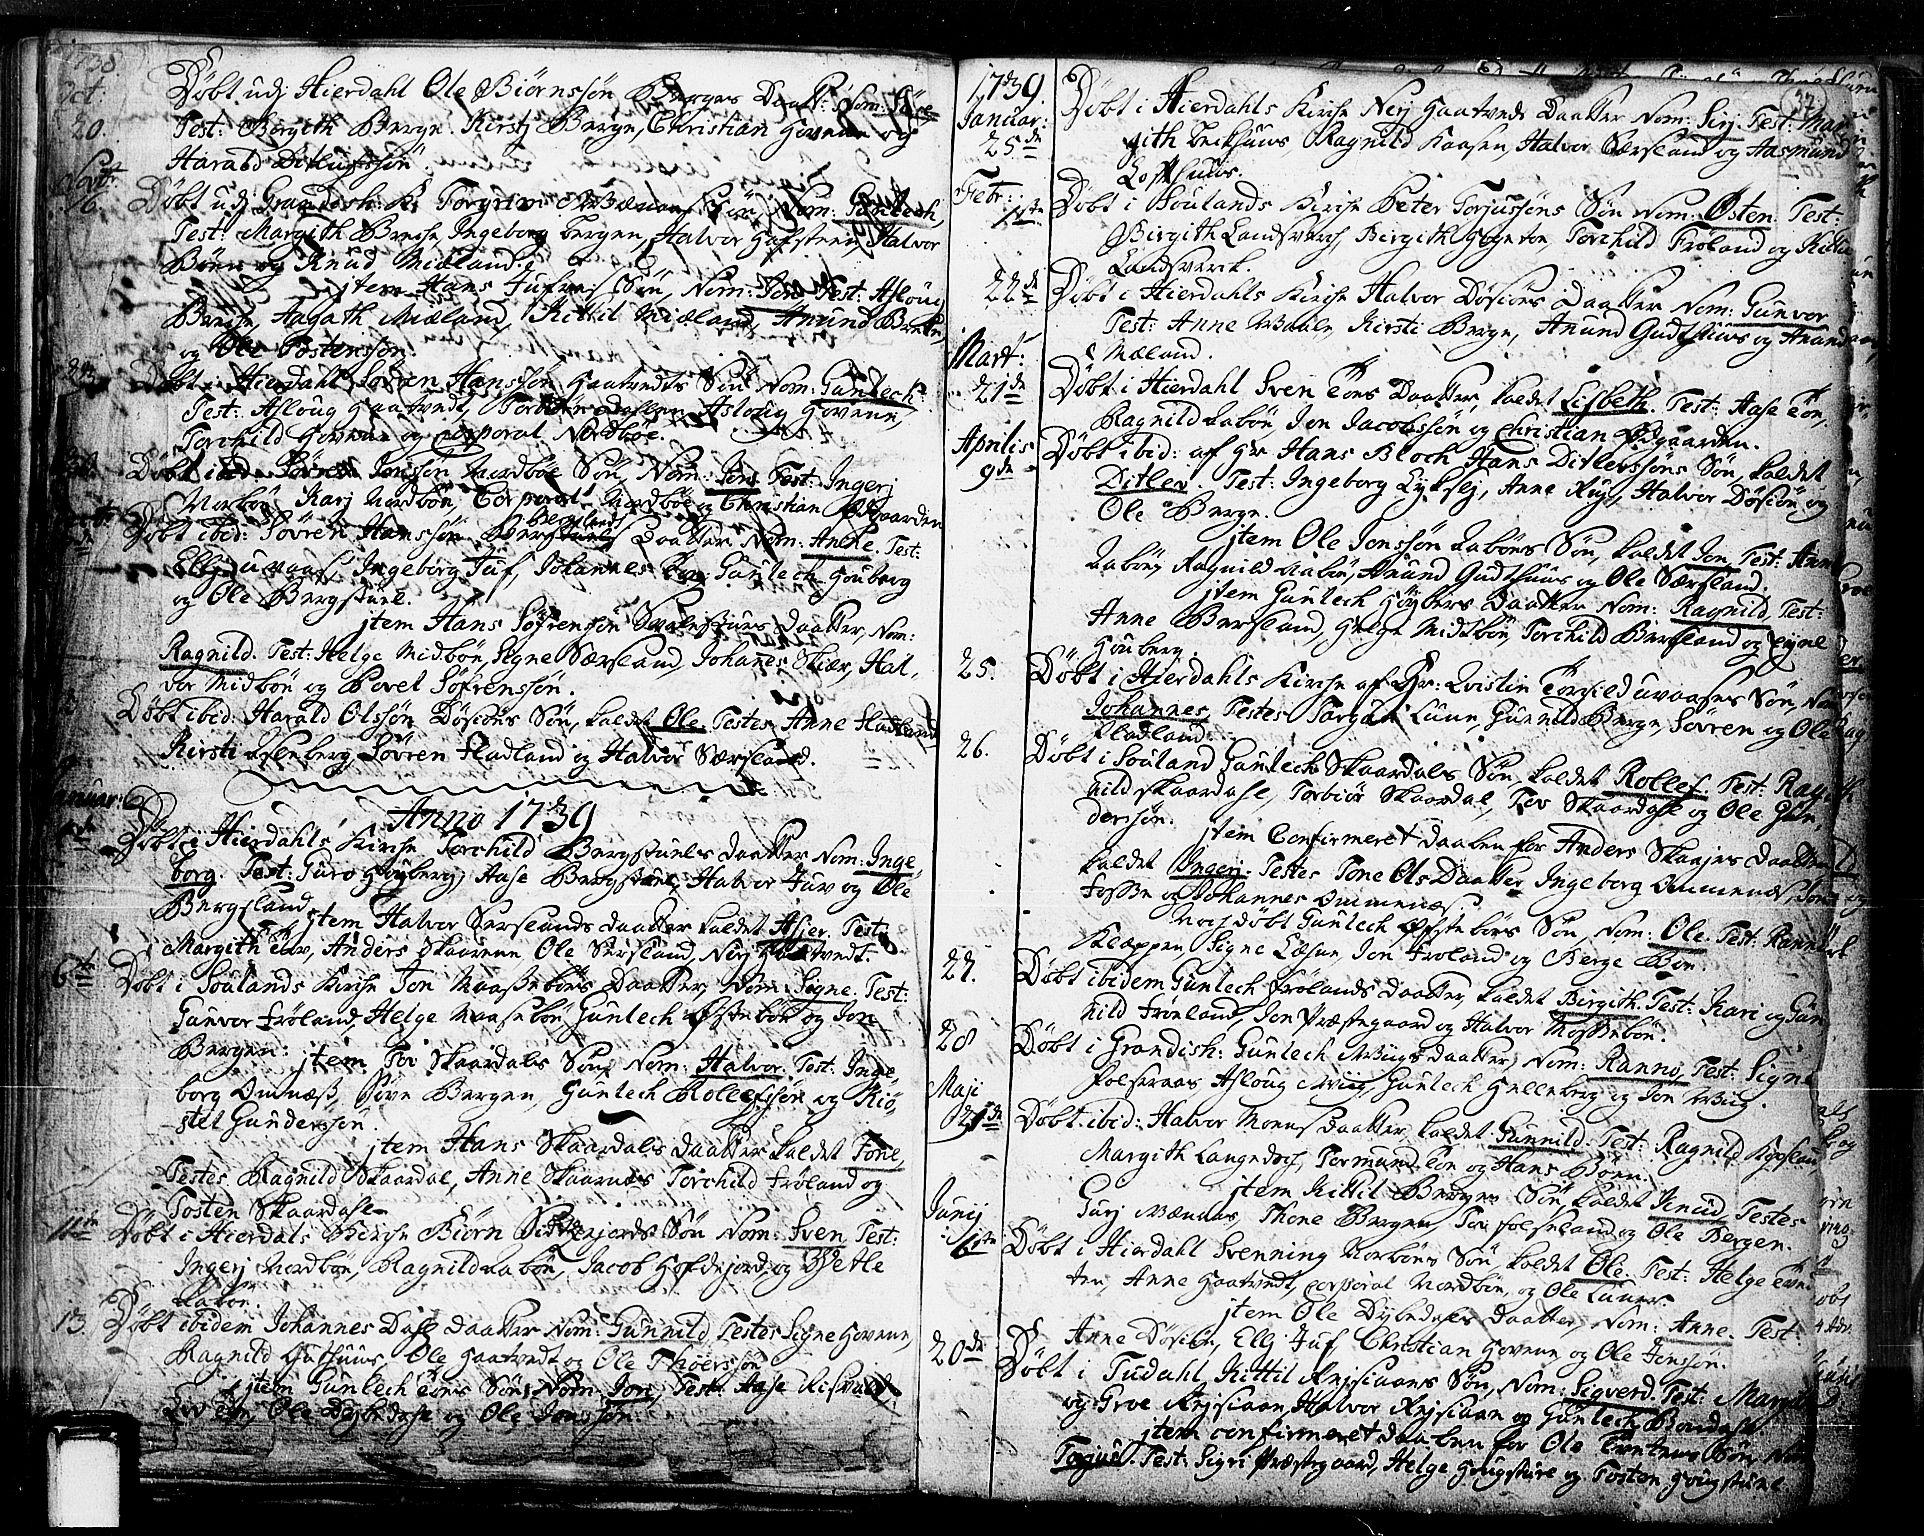 SAKO, Hjartdal kirkebøker, F/Fa/L0003: Ministerialbok nr. I 3, 1727-1775, s. 37